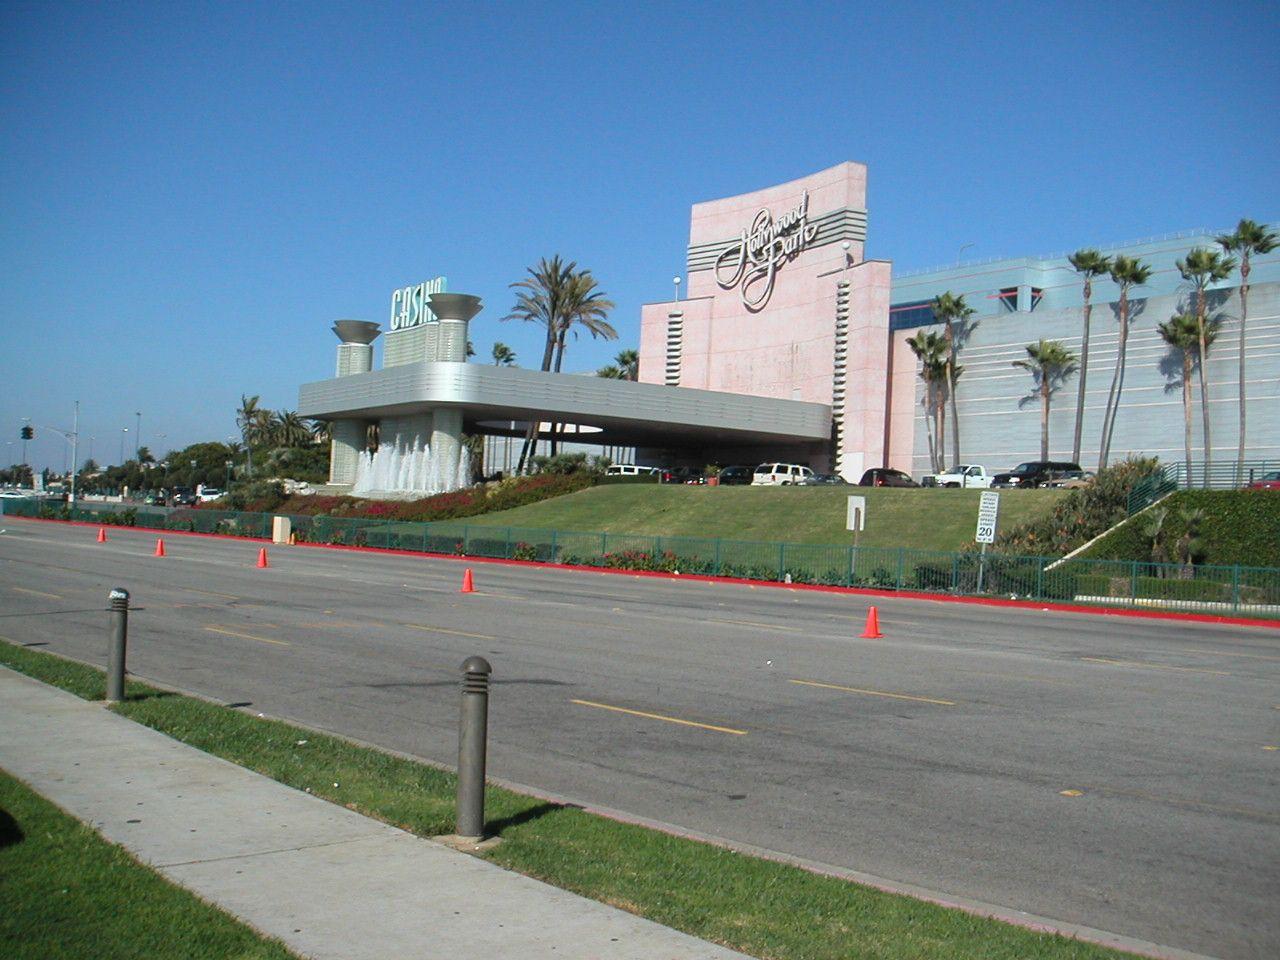 Job fair hollywood park casino operation genesis online game